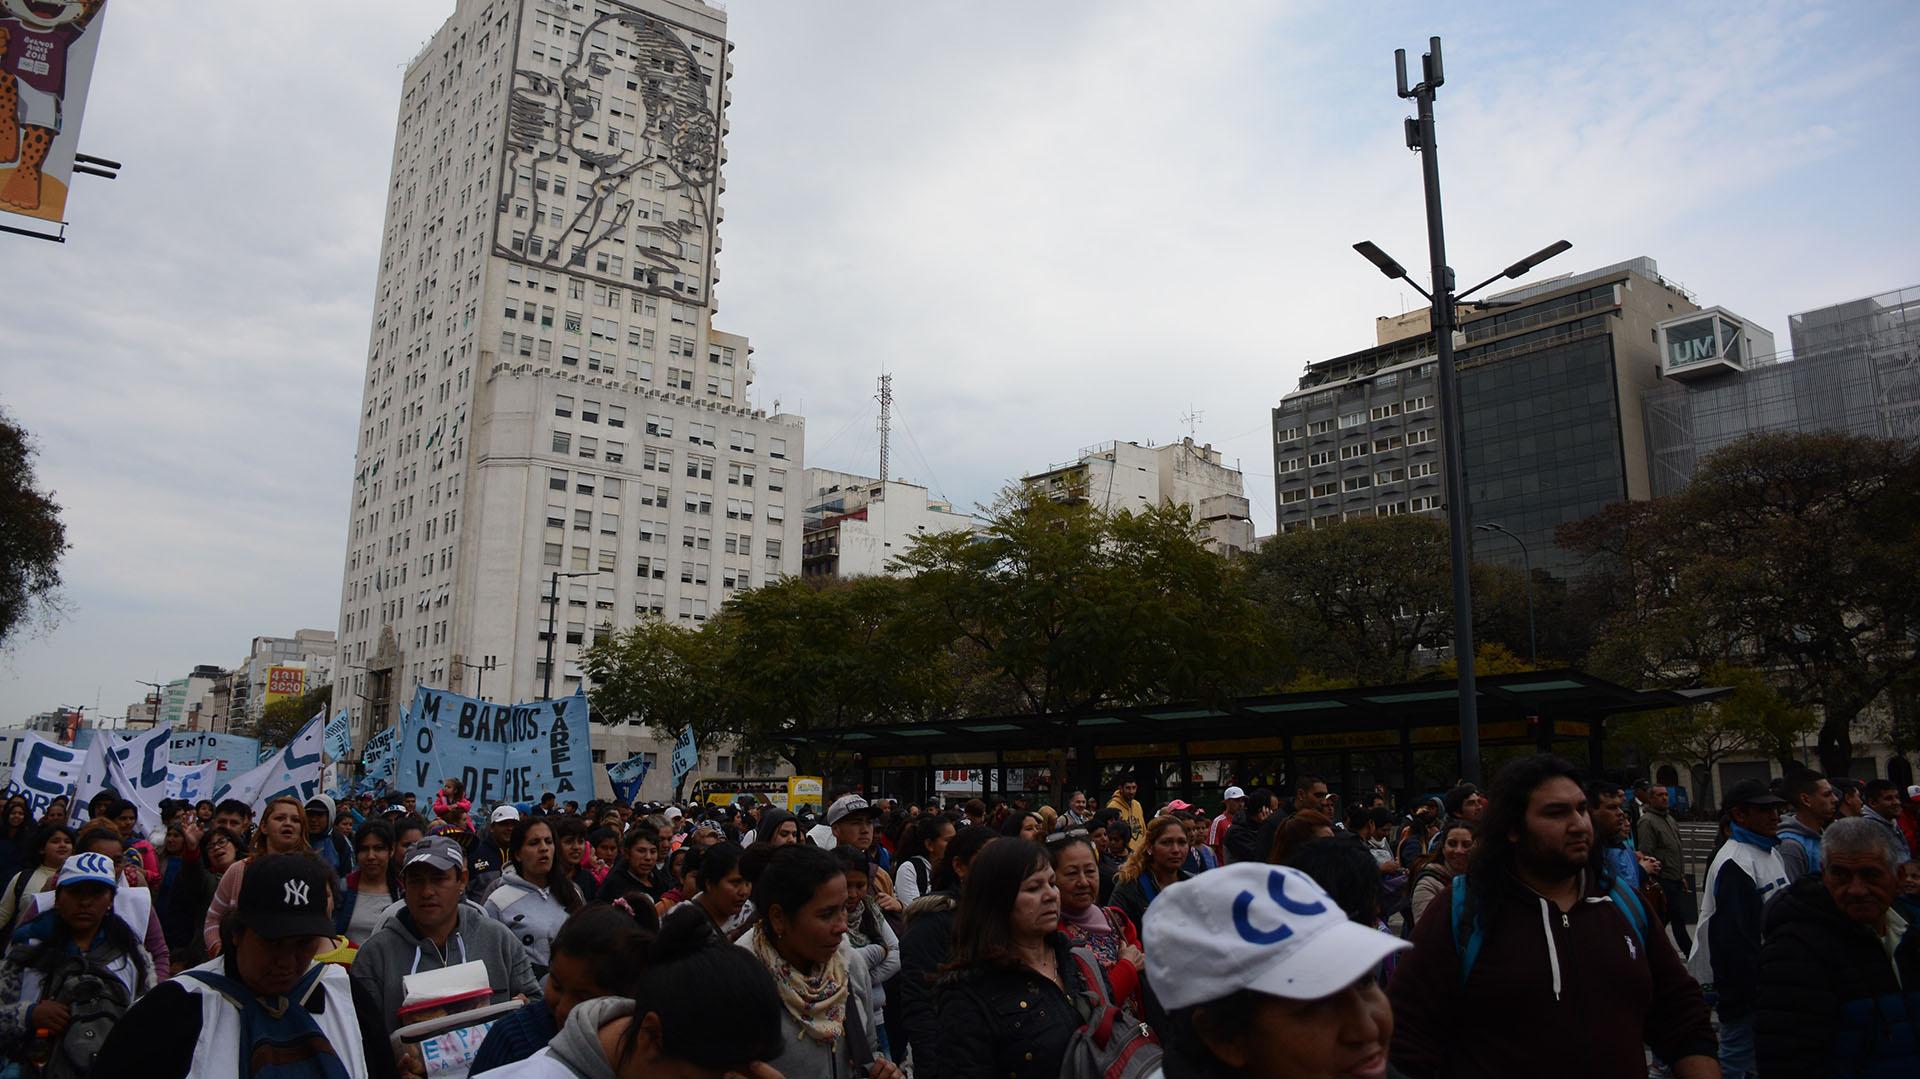 La protesta tuvo lugar frente al Ministerio de Desarrollo Social